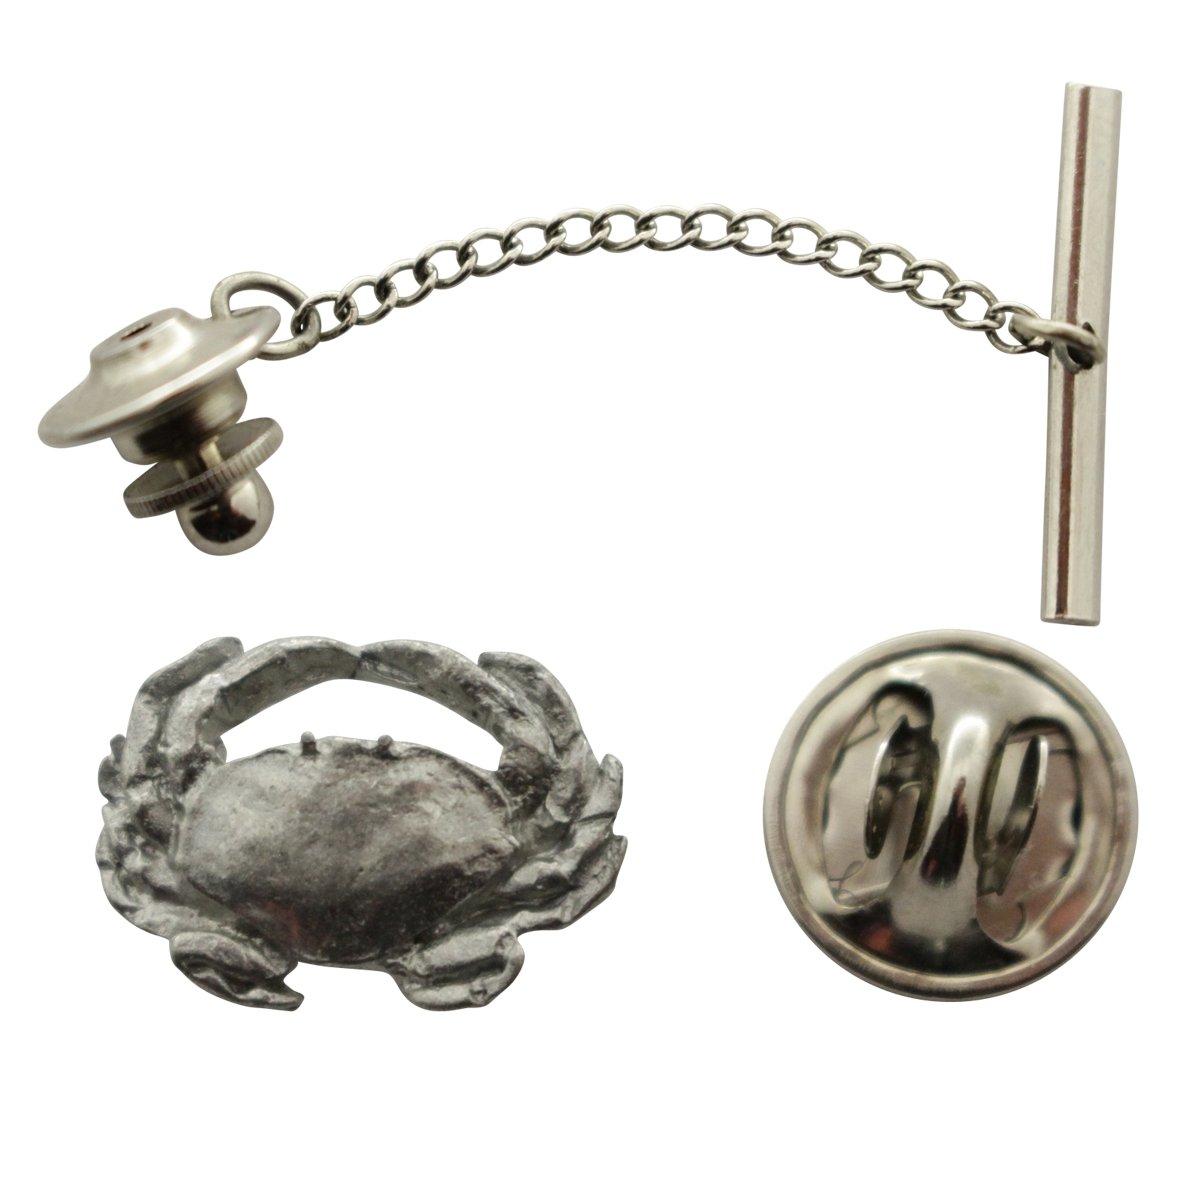 Dungeness Crab Tie Tack ~ Antiqued Pewter ~ Tie Tack or Pin ~ Sarah's Treats & Treasures